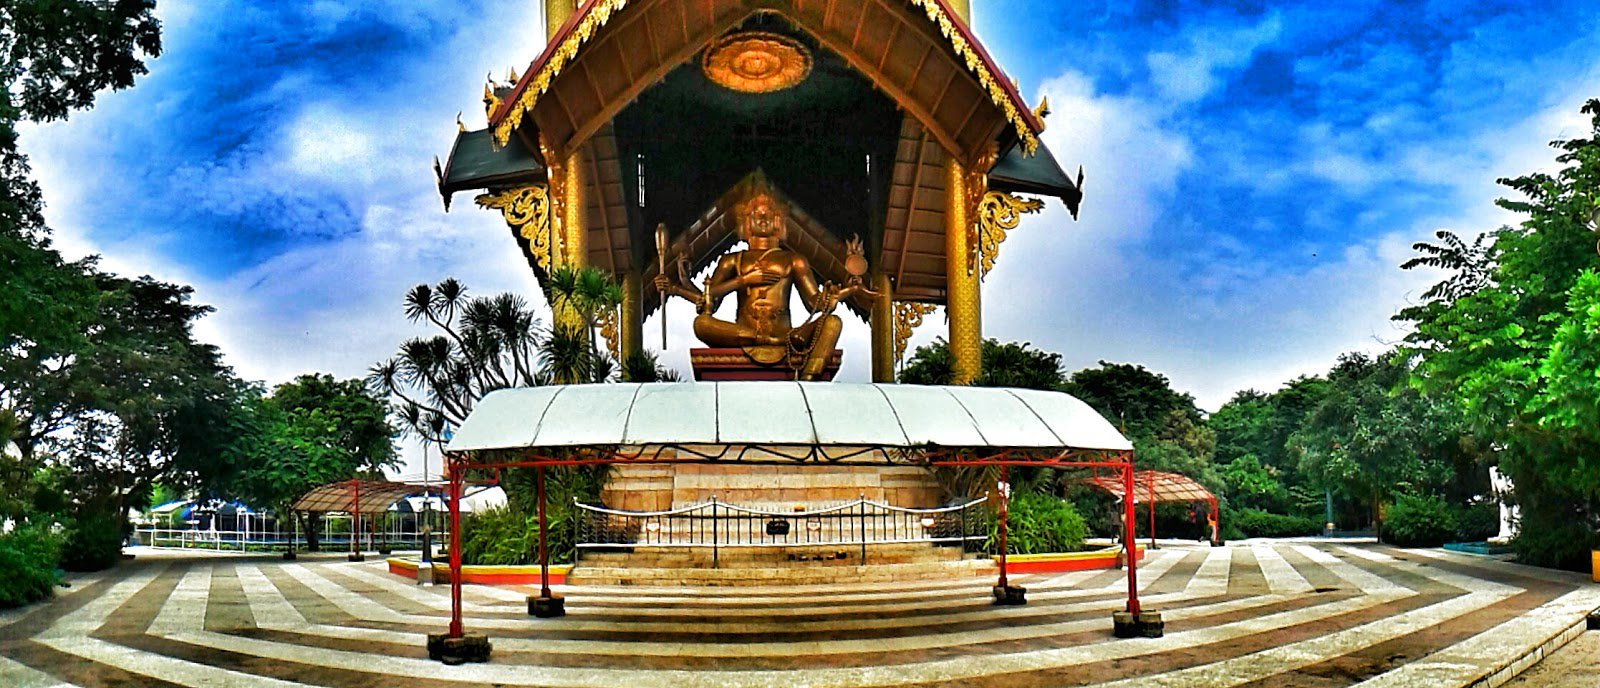 35 Tempat Wisata Surabaya Terpopuler Dikunjungi Patung Budha Kelenteng Hong